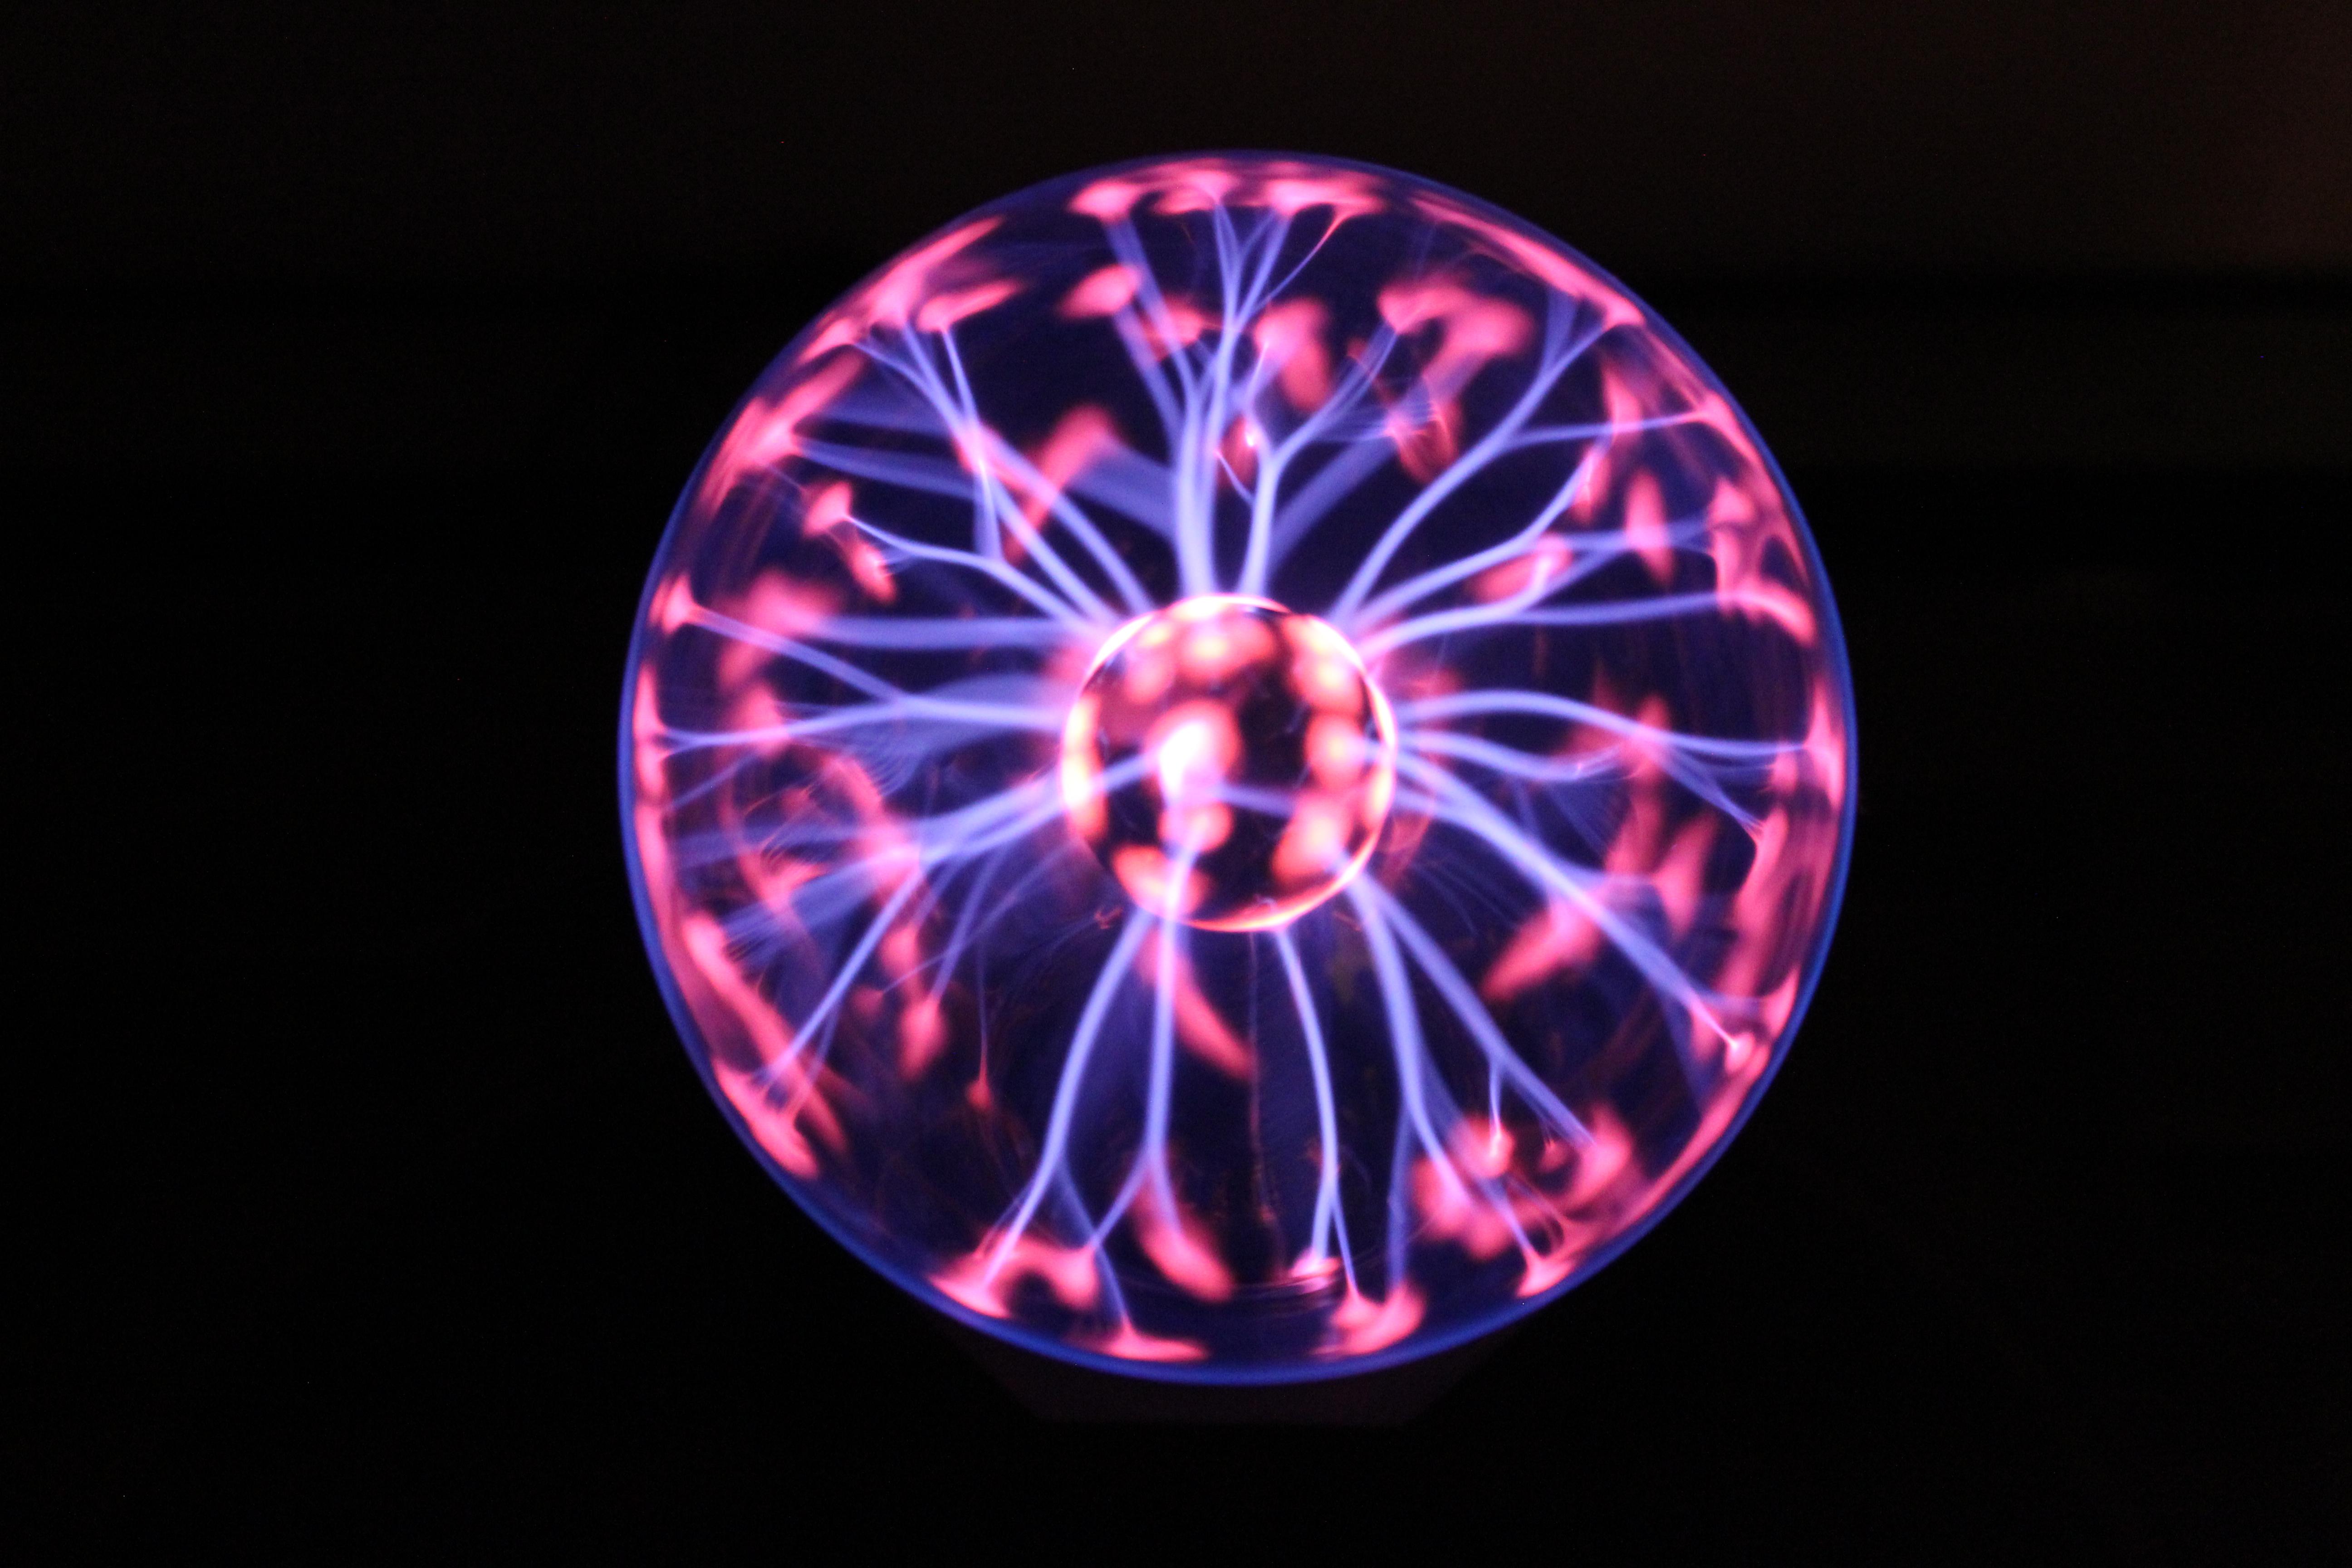 File Plasmakugel Plasma Ball Jpg Wikimedia Commons